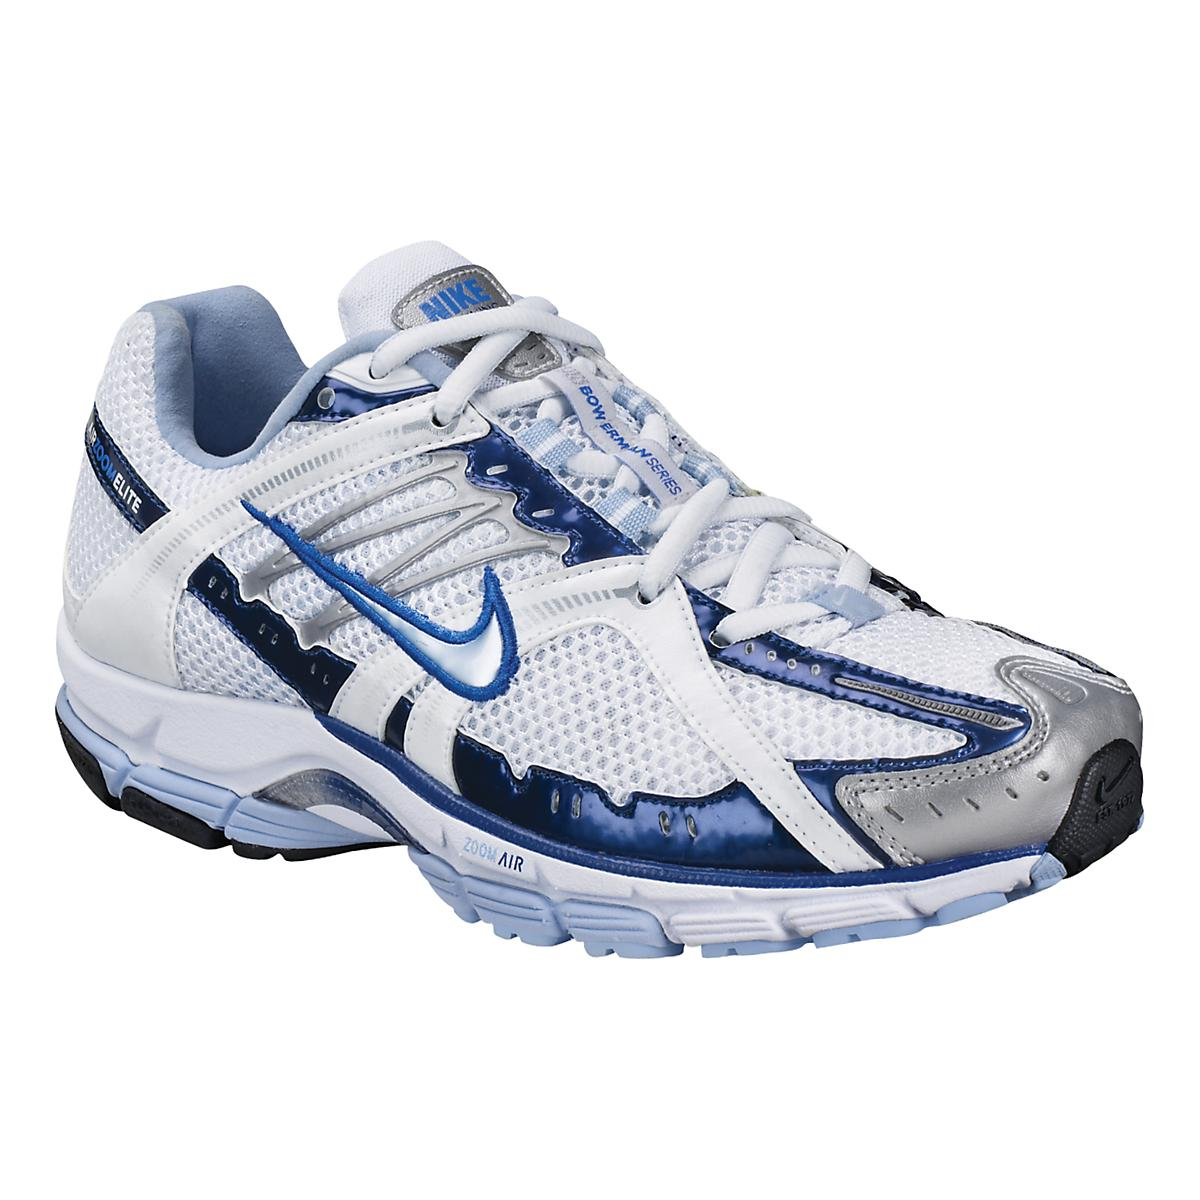 Womens Nike Air Zoom Elite III Running Shoe at Road Runner Sports b5aca5ce0